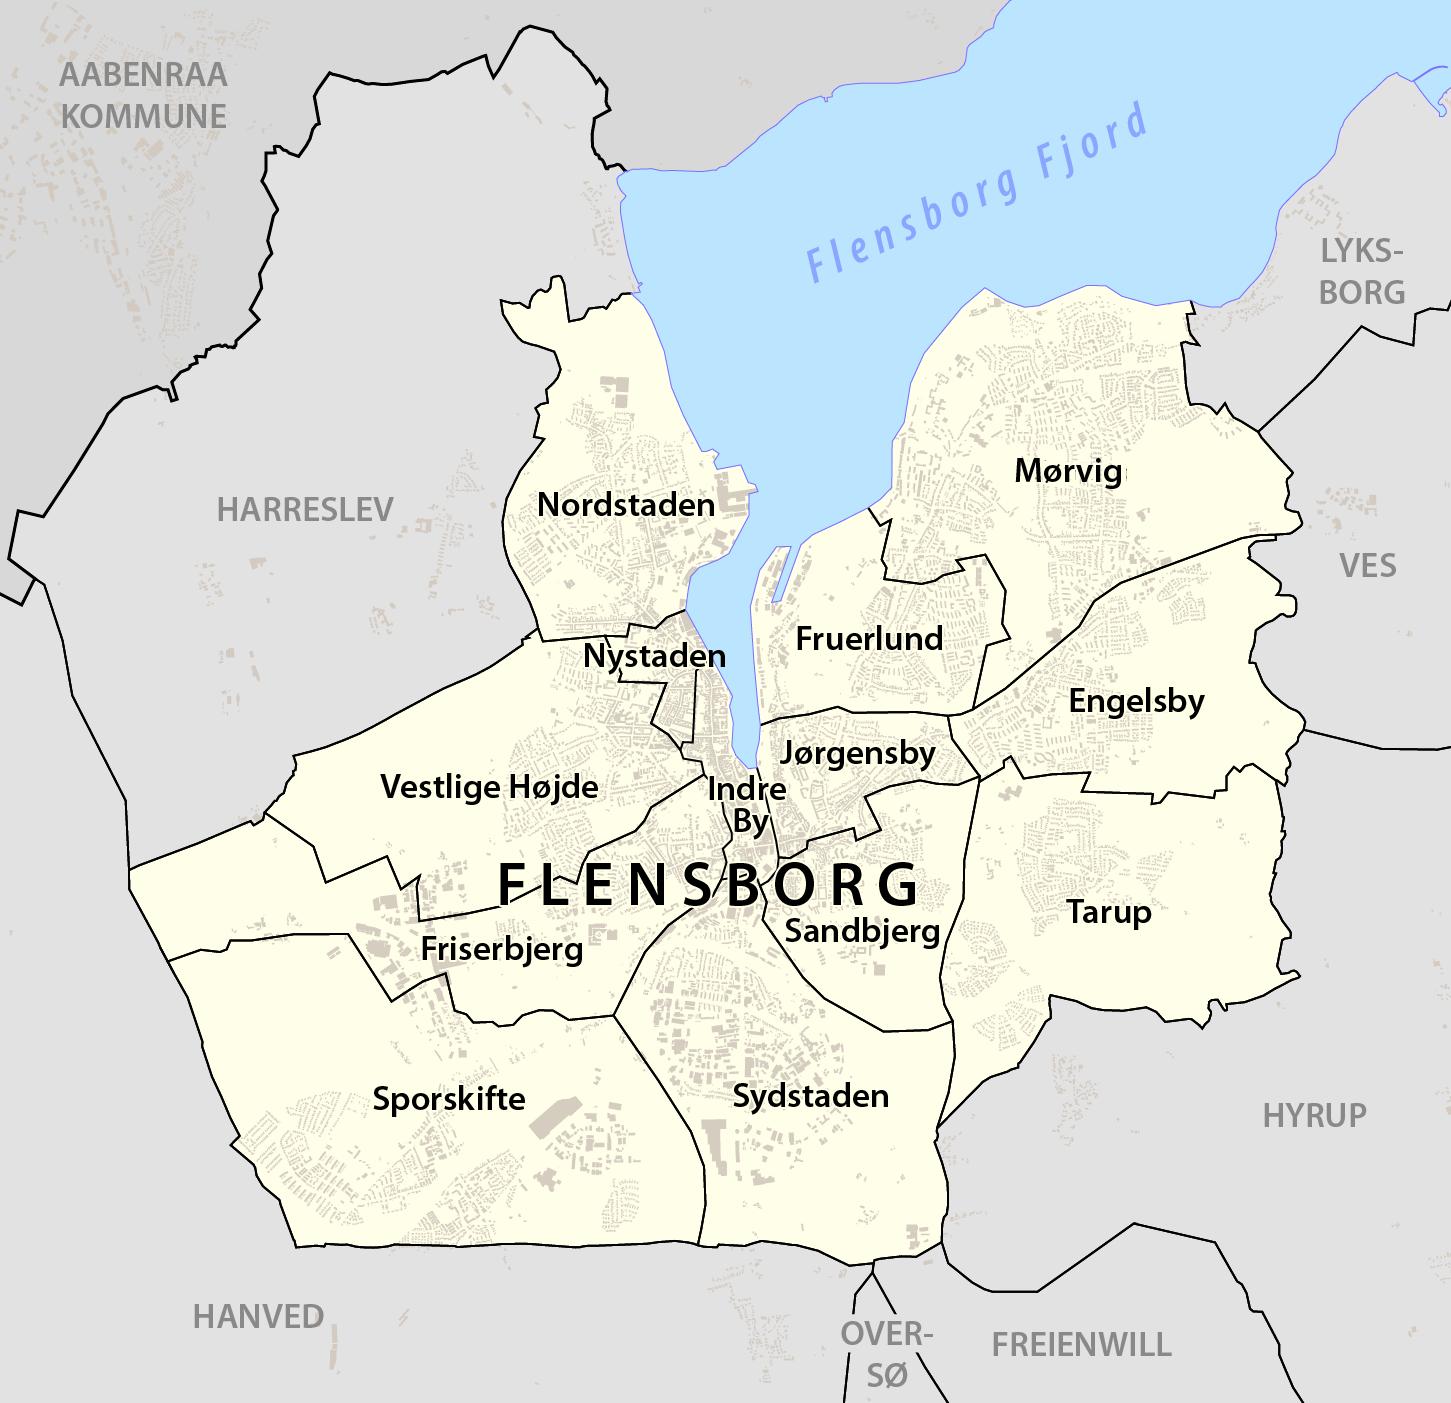 flensburg karte Datei:Karte Stadtteile Flensburg (da).png – Wikipedia